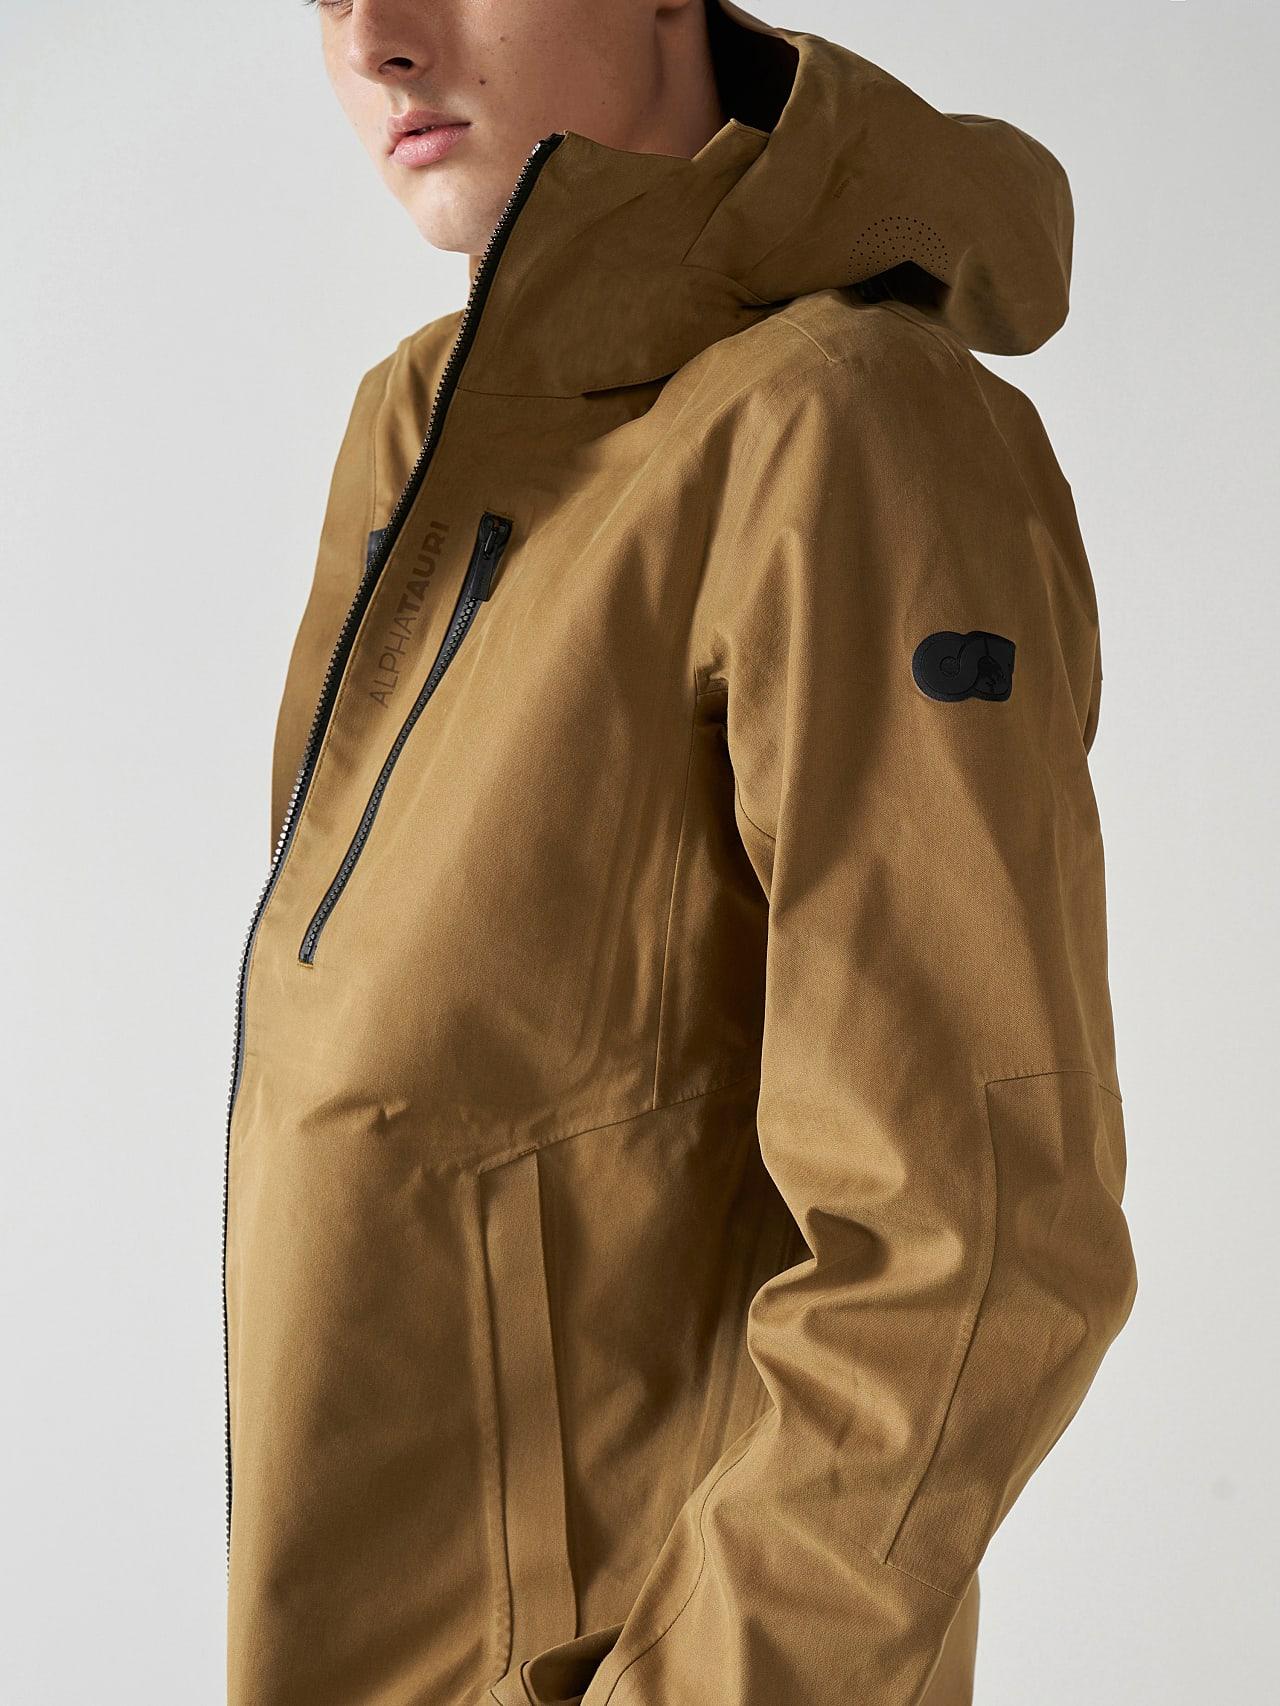 OKOVO V3.Y5.01 Packable Waterproof Jacket brown Right Alpha Tauri